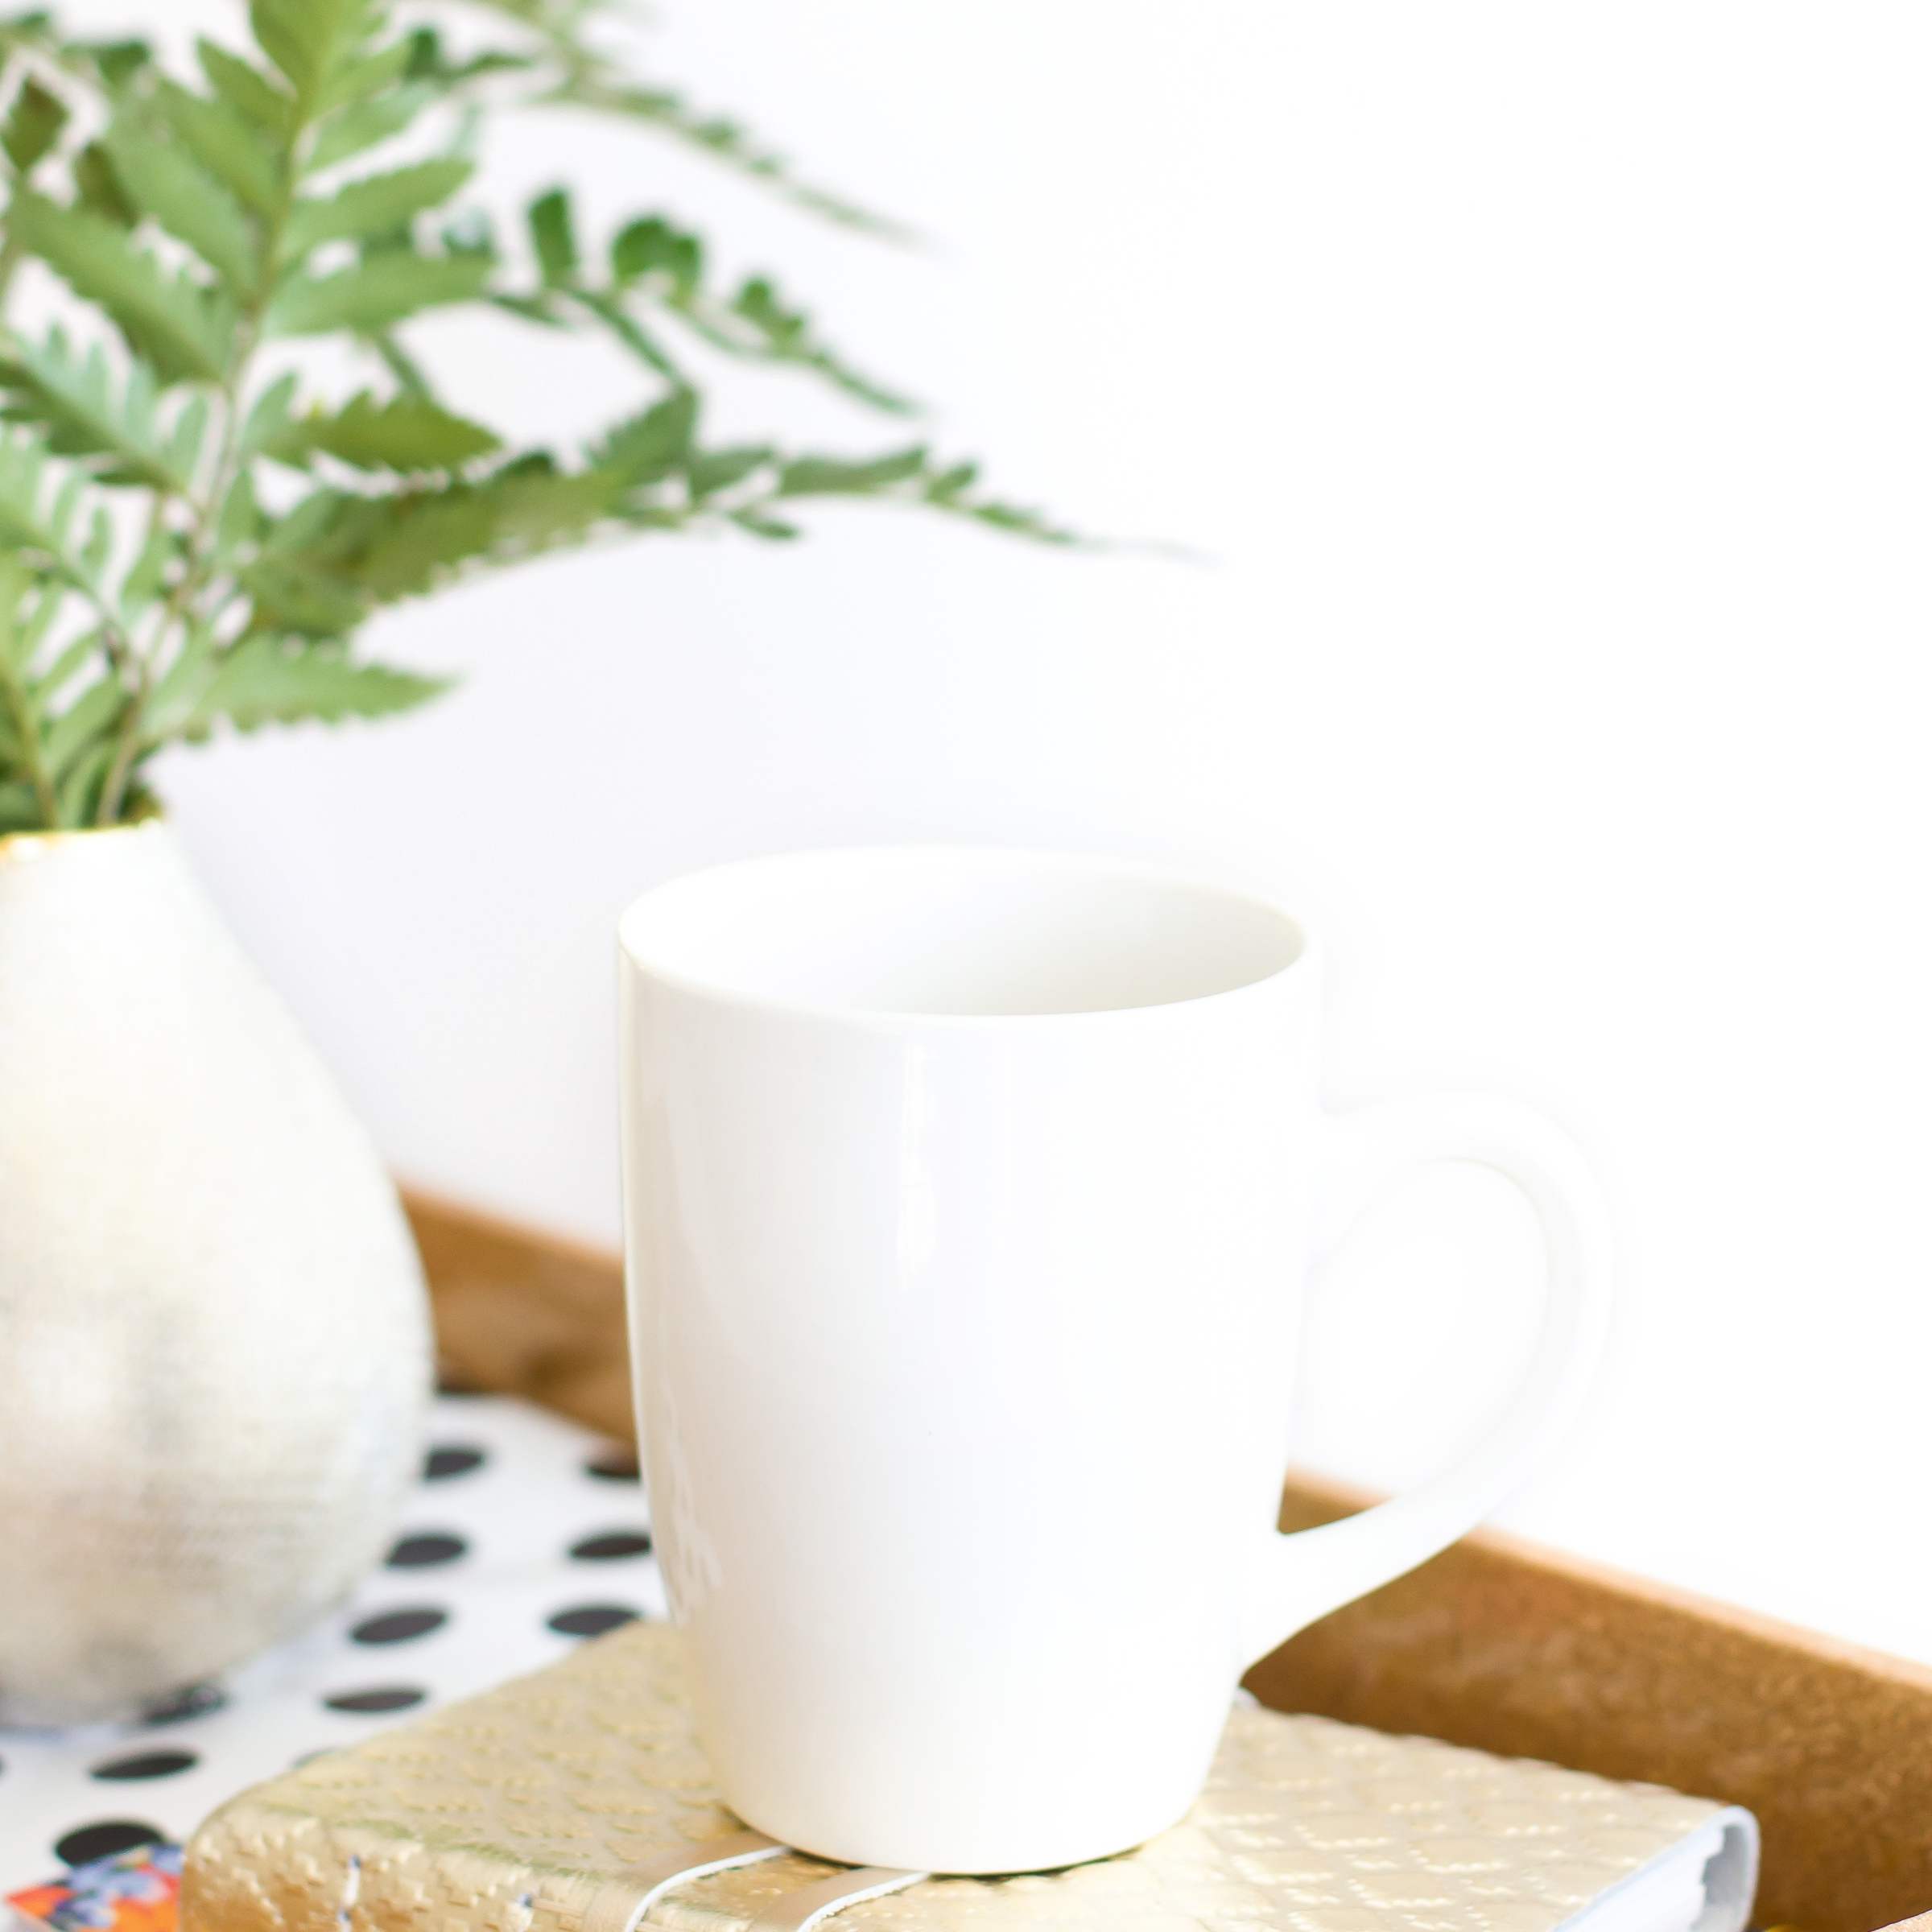 hc-styled-stock-photography-coffee-mugs-4-edit.jpg